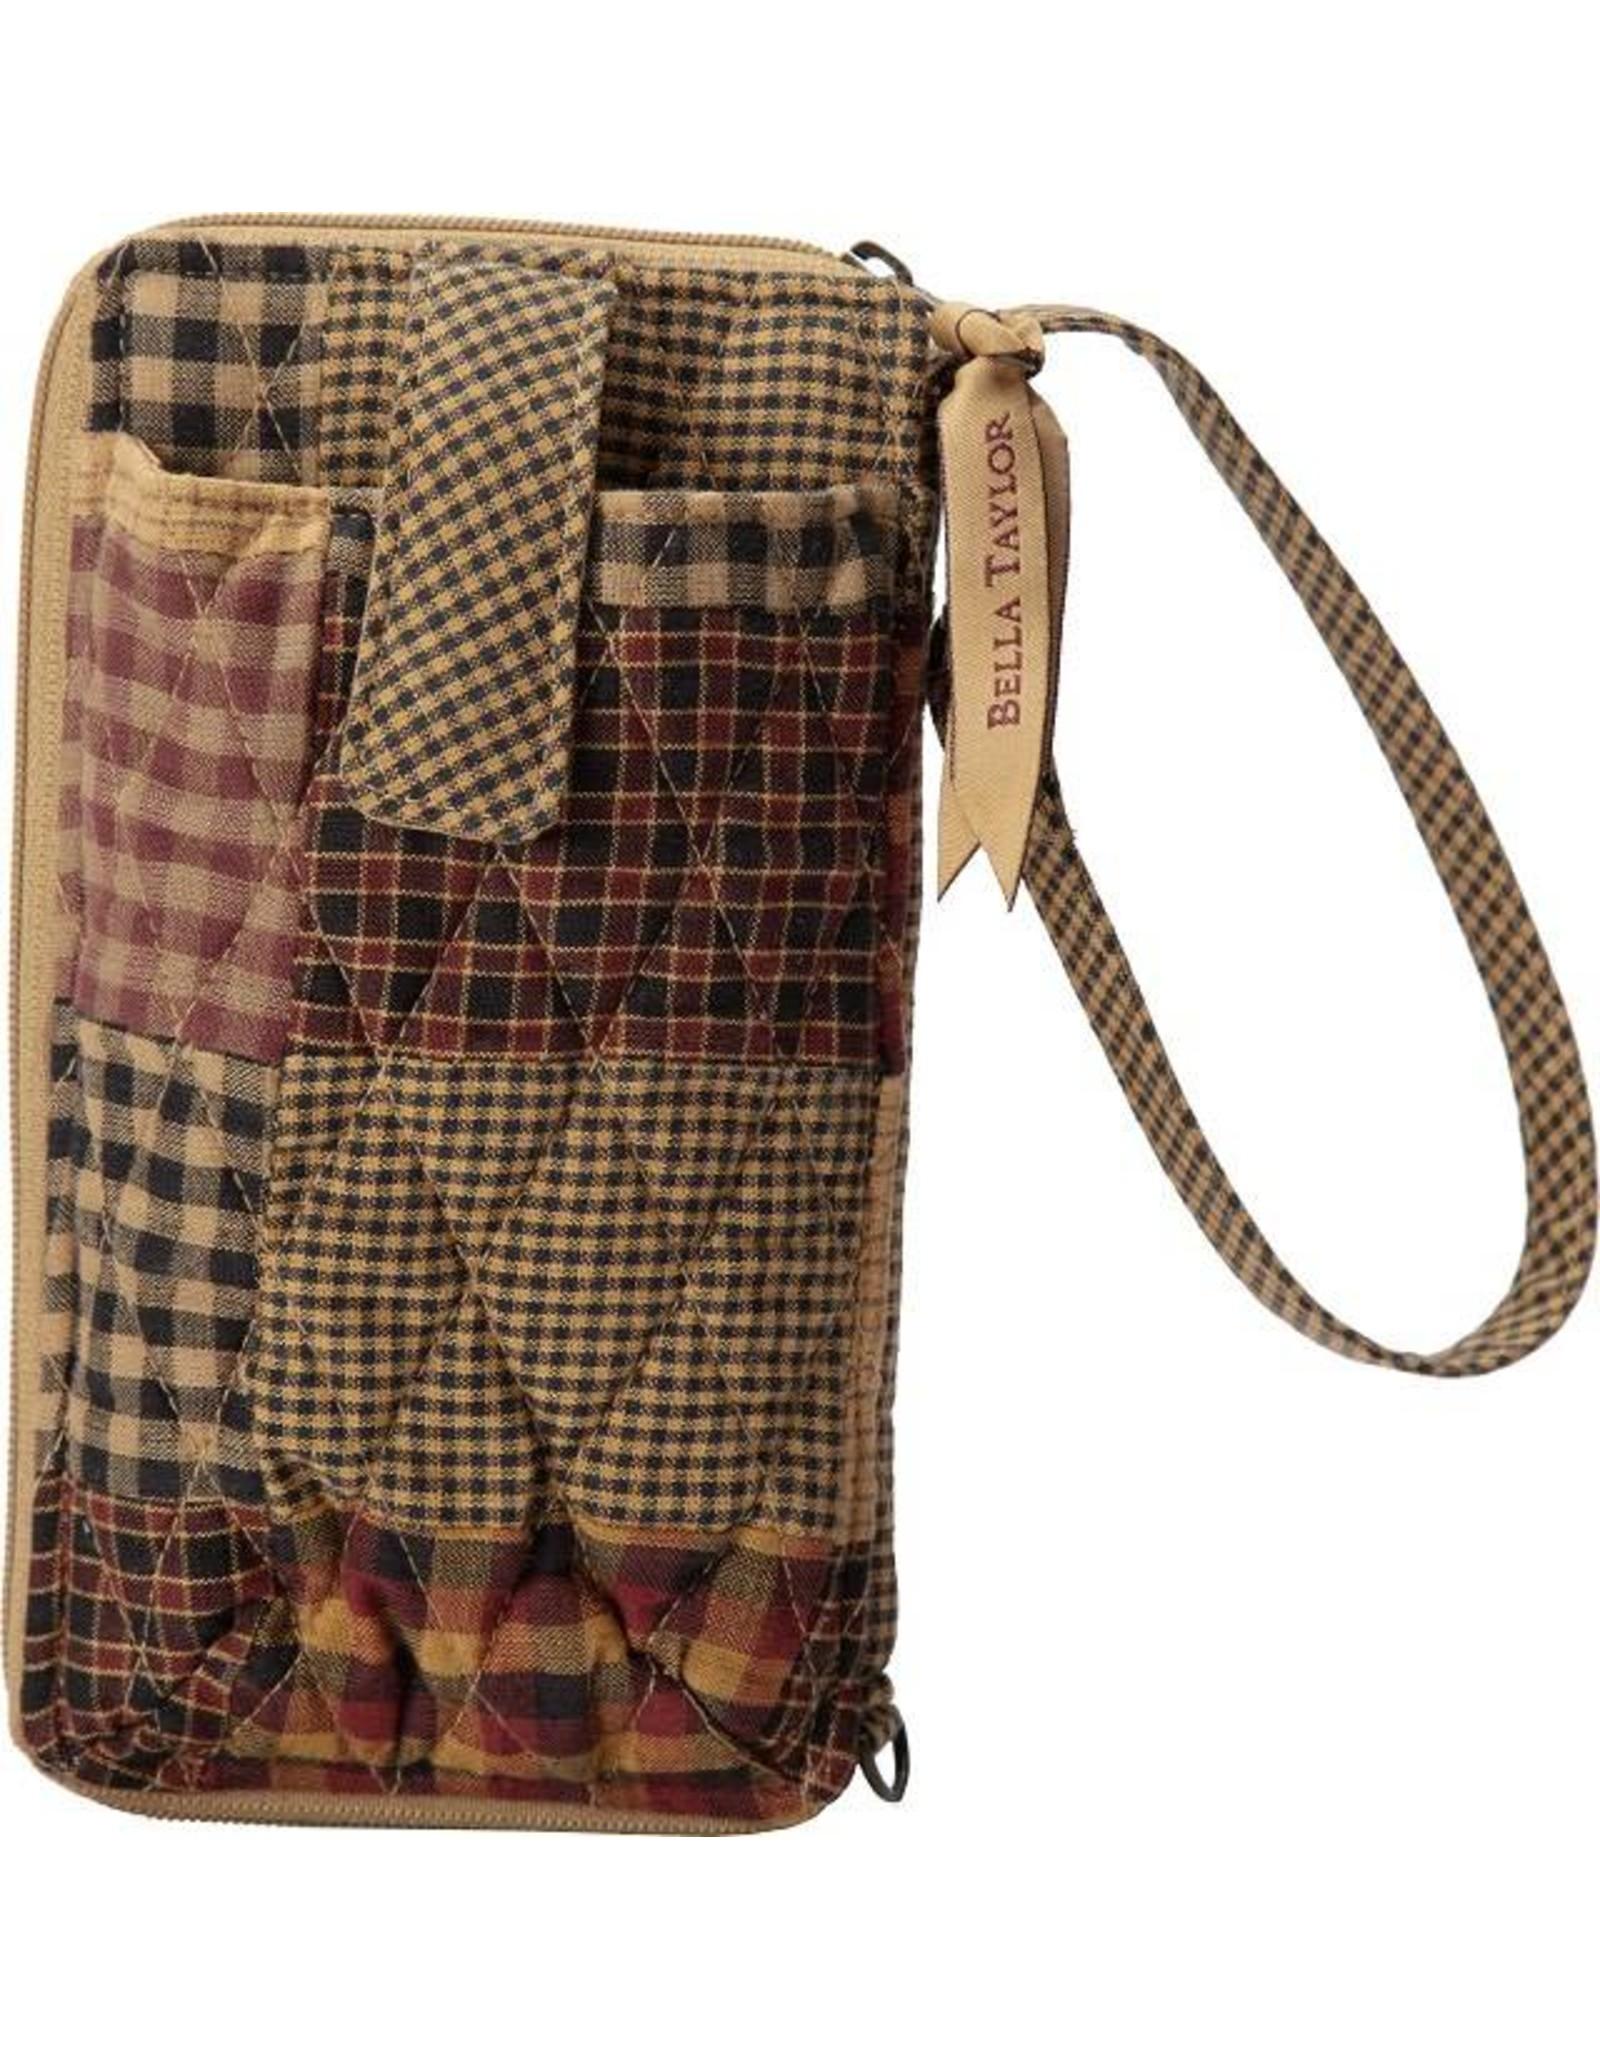 Bella Taylor Heritage - Modern Wristlet Wallet